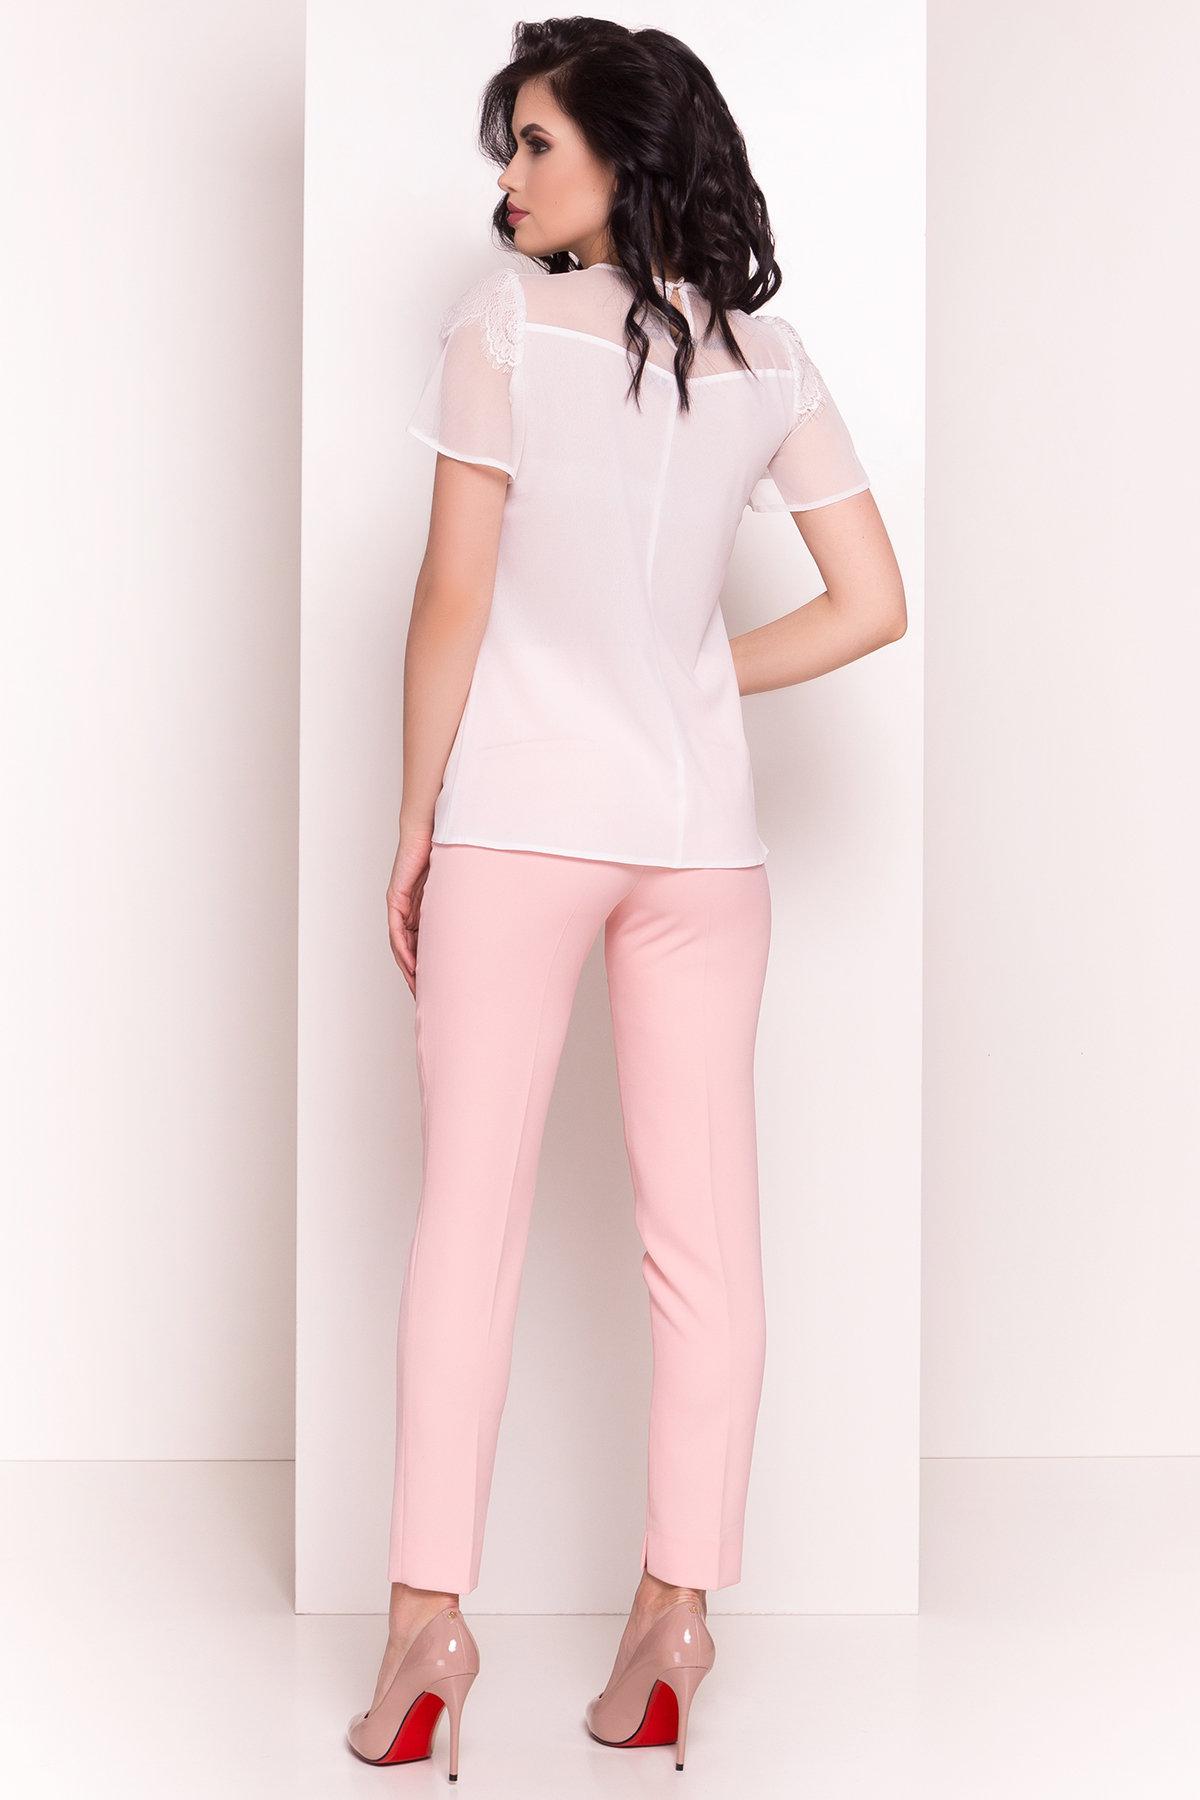 Блуза Миларо 5071 АРТ. 35580 Цвет: Молоко - фото 4, интернет магазин tm-modus.ru